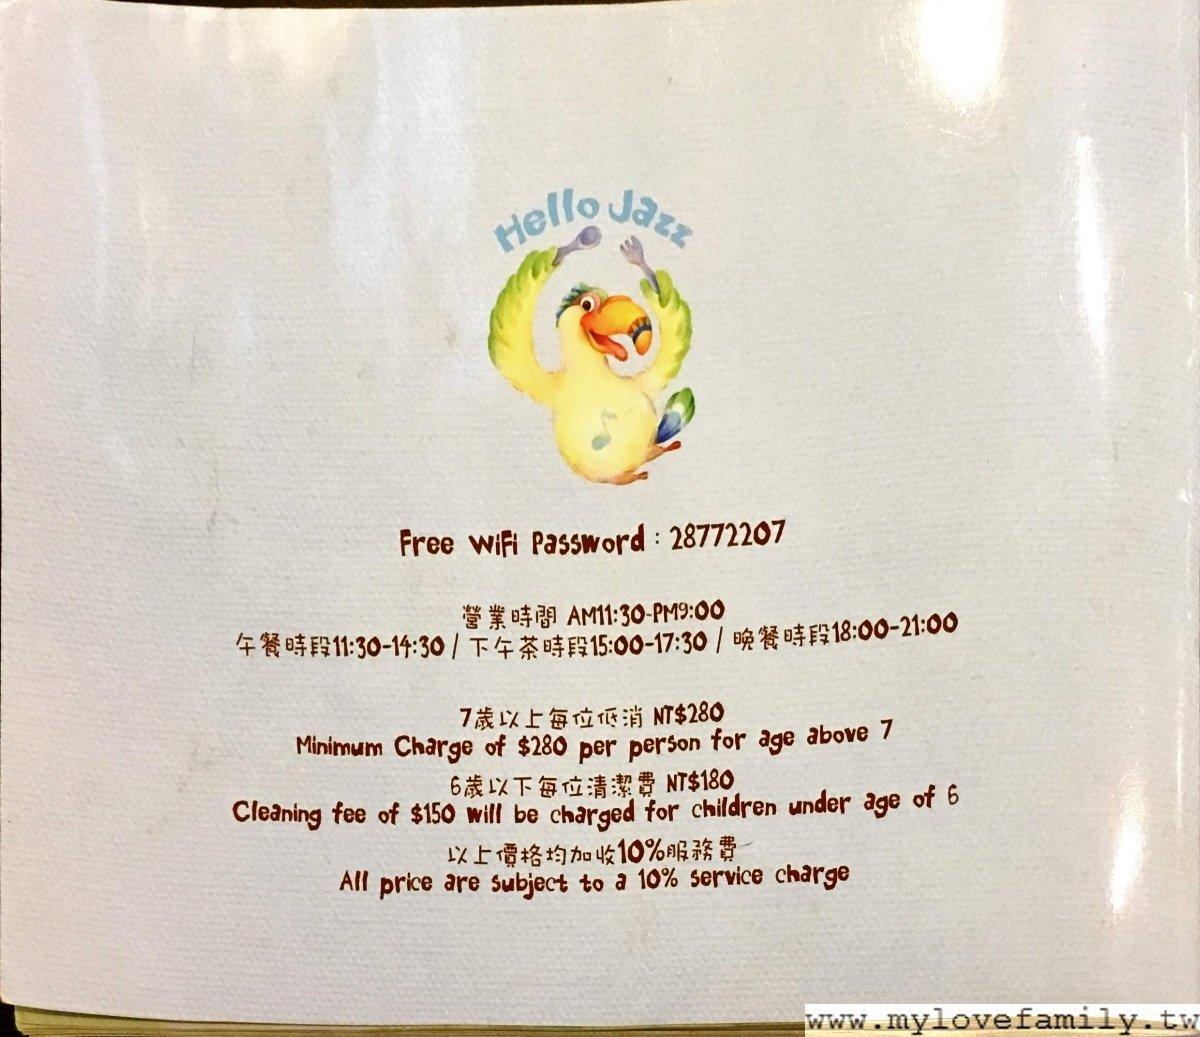 HelloJazz親子餐廳